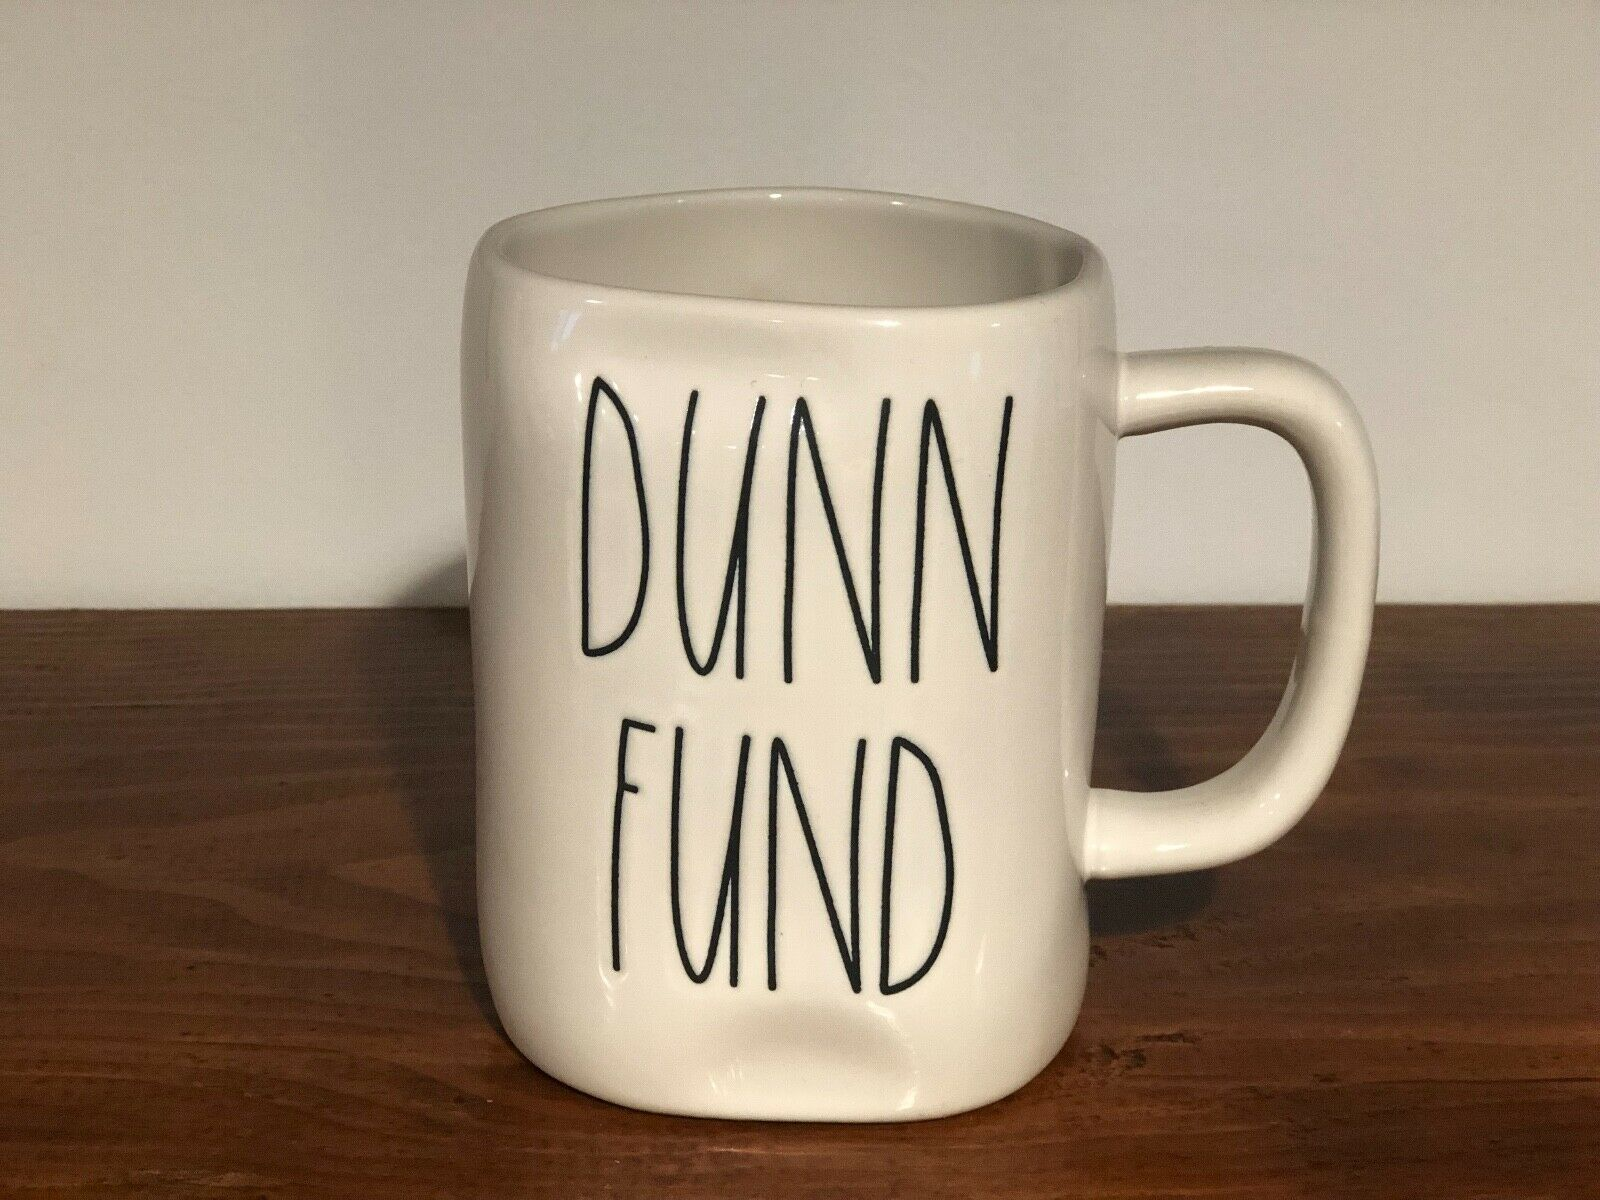 Rae Dunn Artisan Collection By Magenta Farmhouse LL Large Letter Coffee Tea Mug DUNN FUND